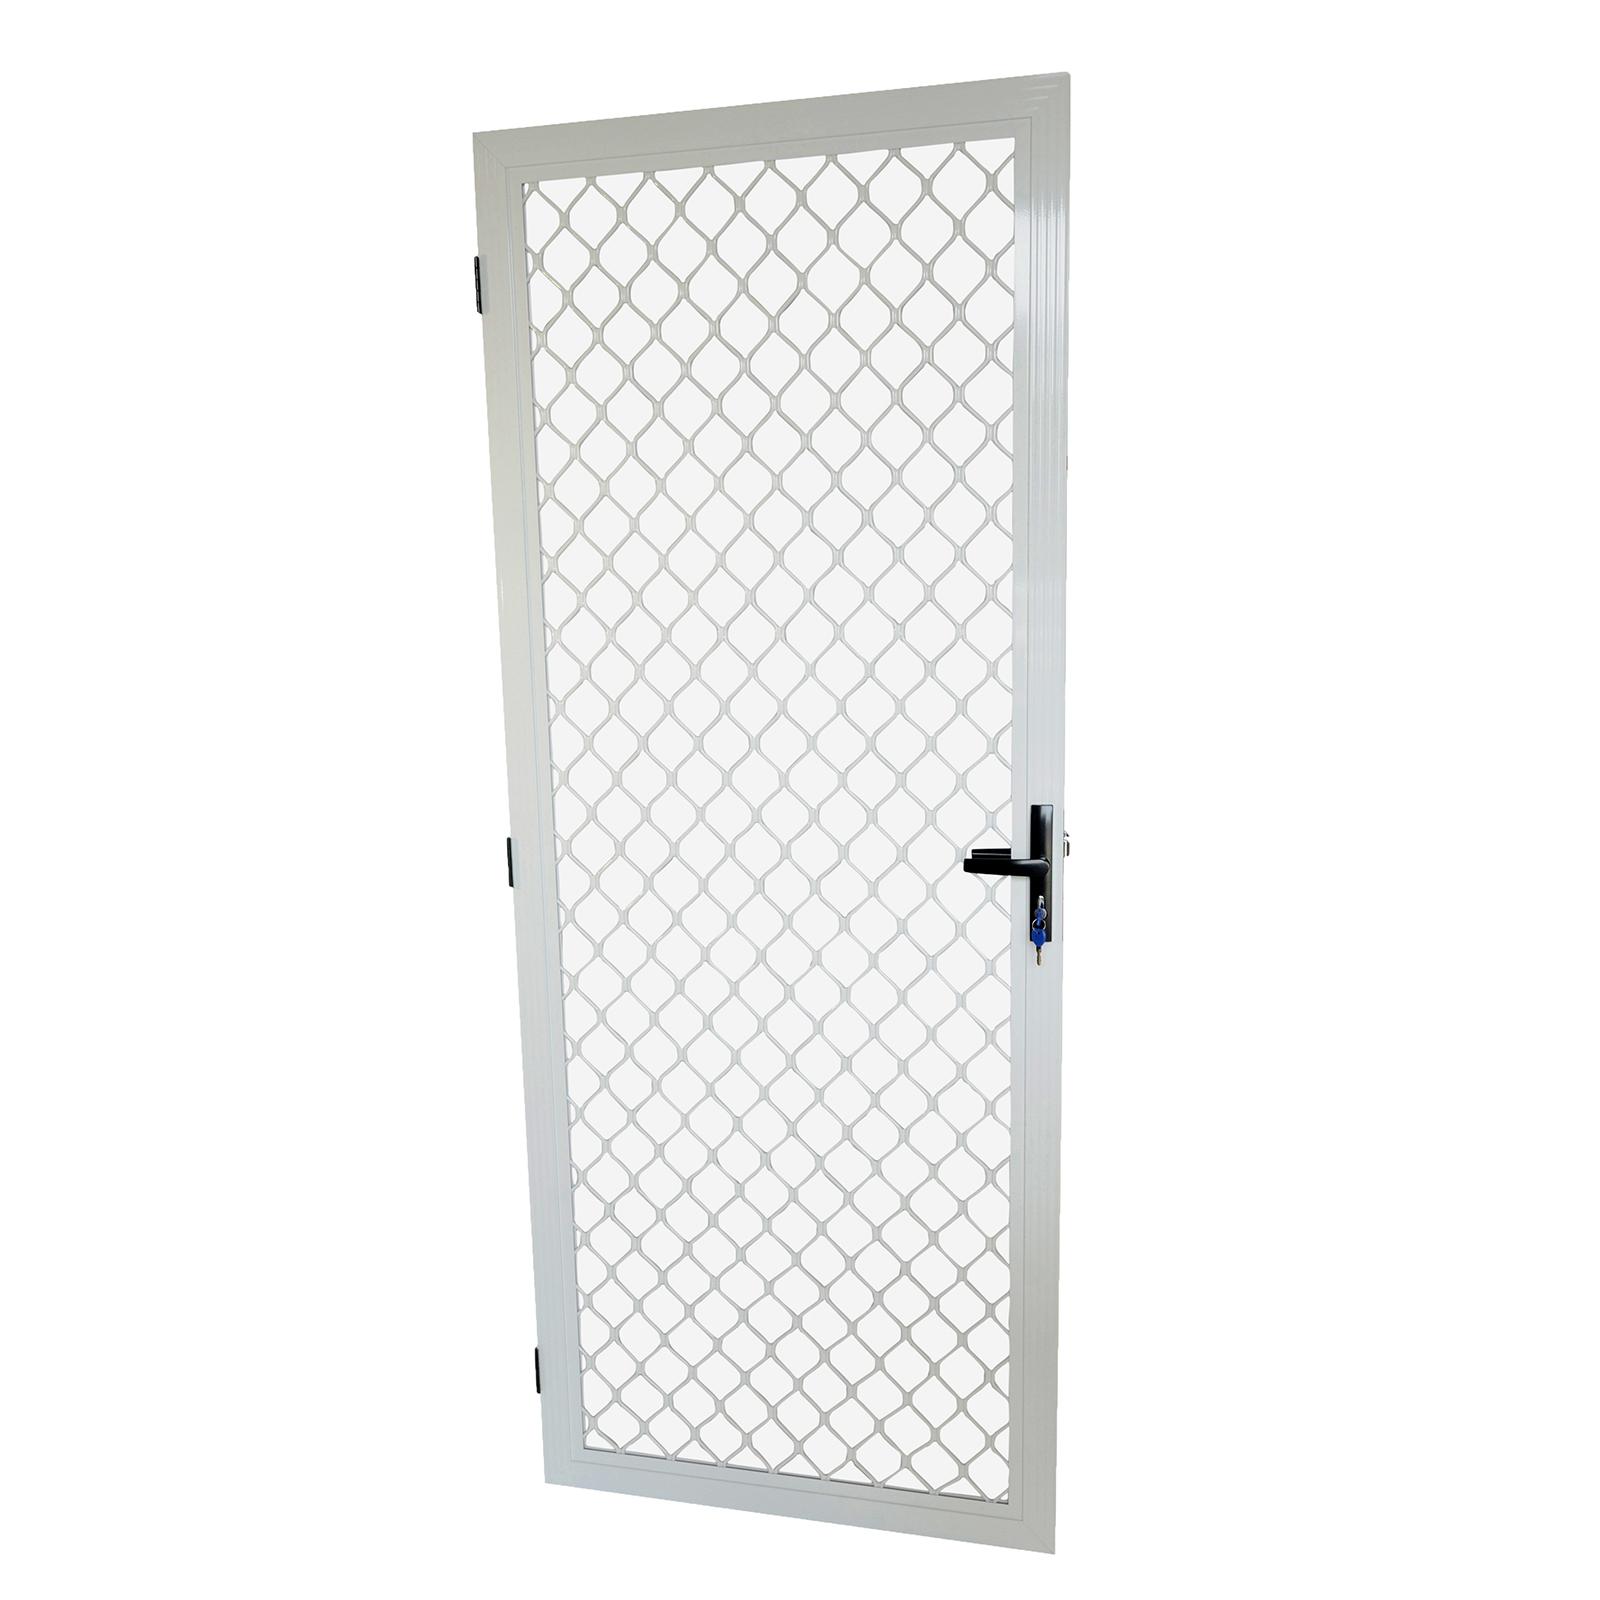 Protector Aluminium 806 x 2024mm White Imperial Fixed Barrier Door